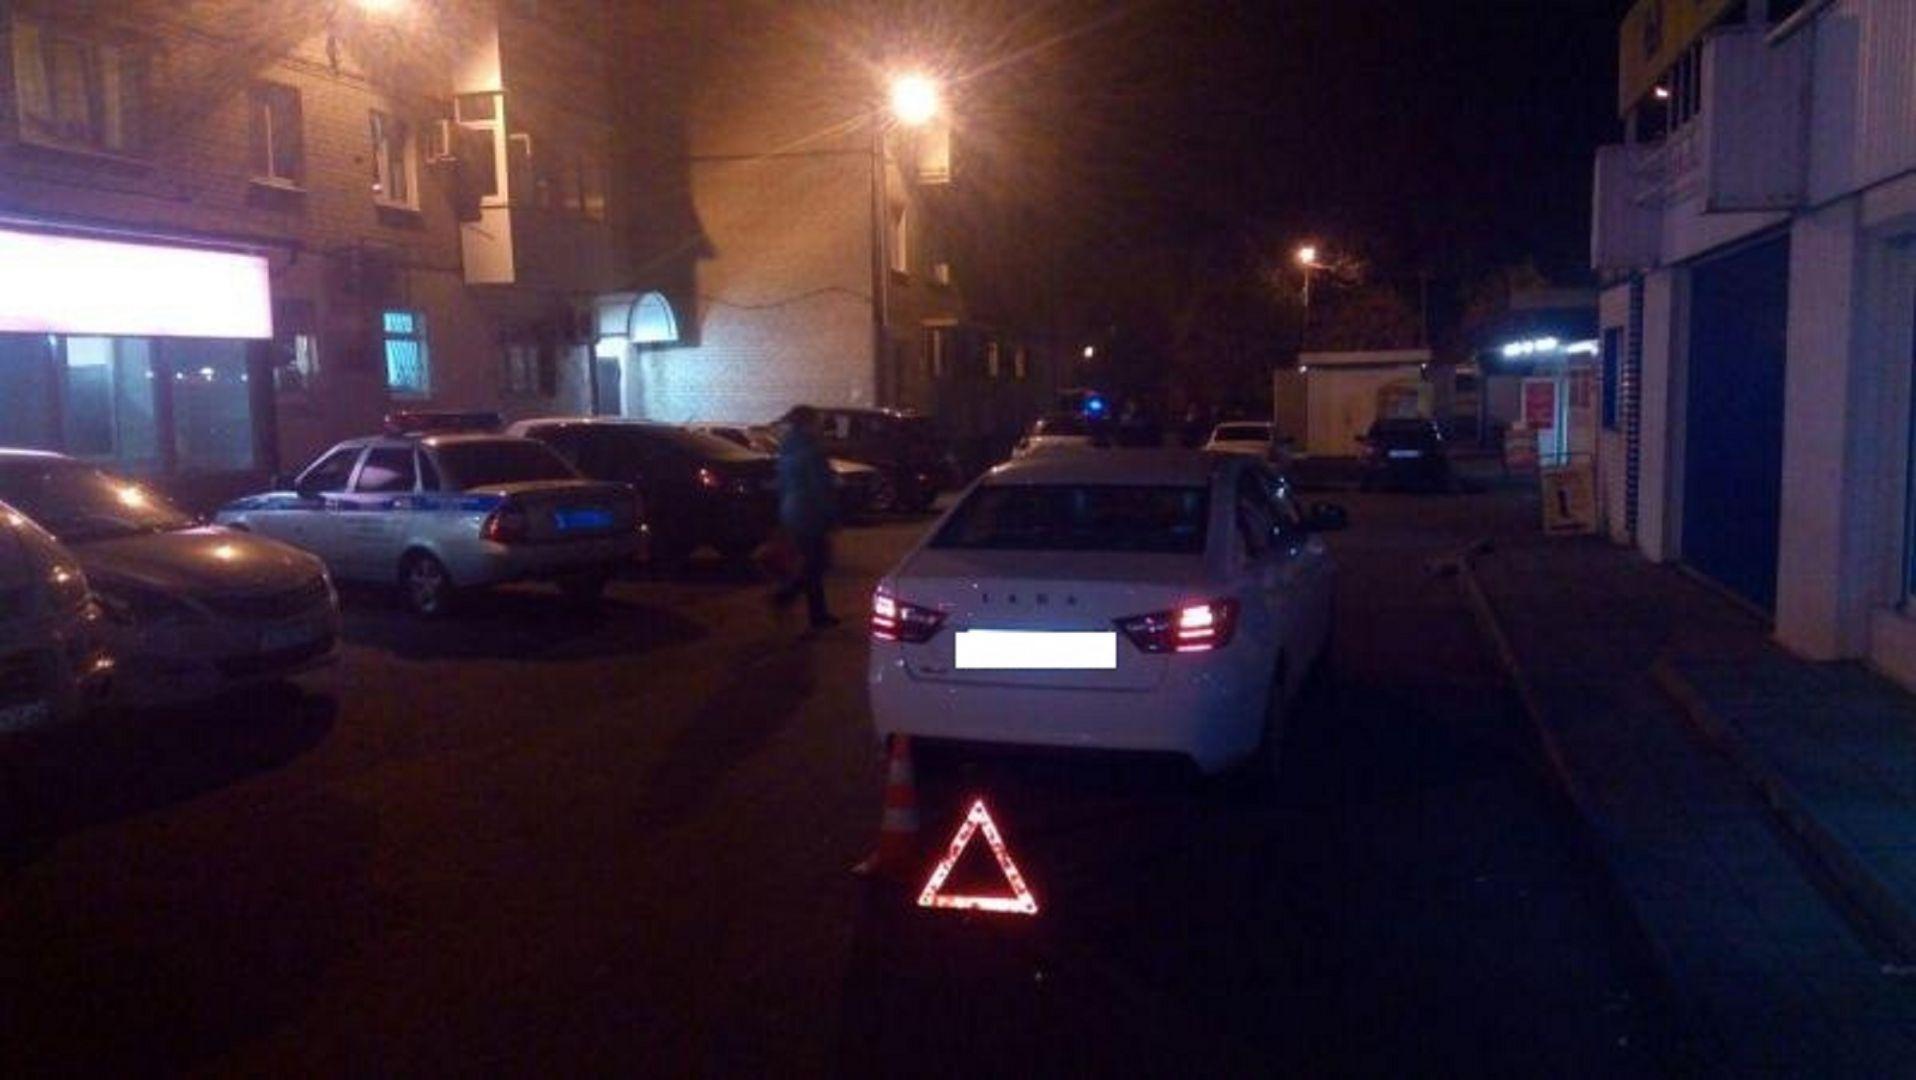 ВСтаврополе 23-летний шофёр сбил пенсионерку на стоянке